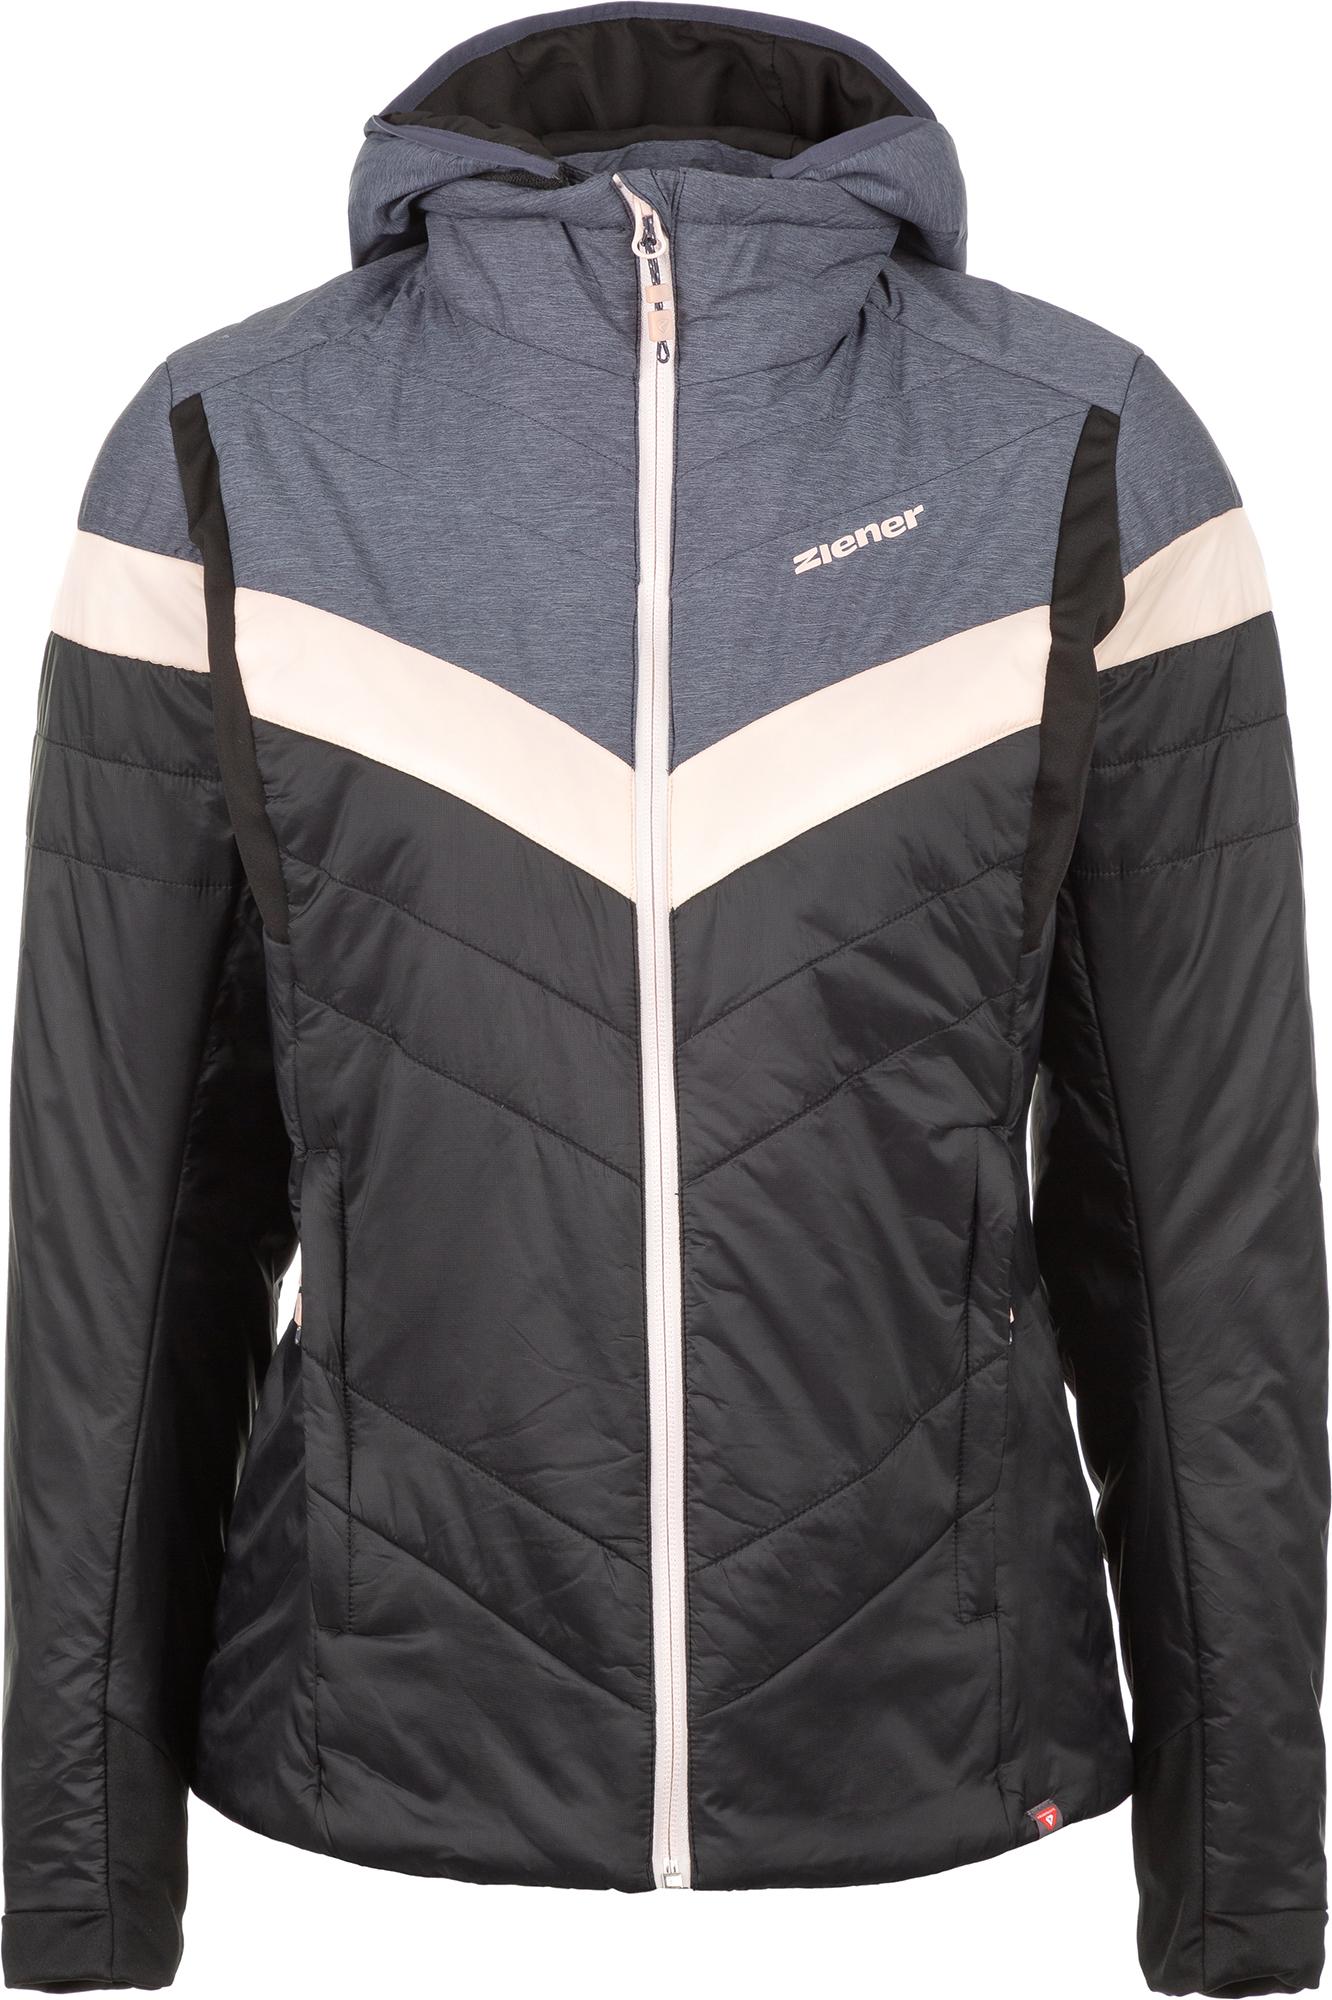 Ziener Куртка утепленная женская Nafalda, размер 48